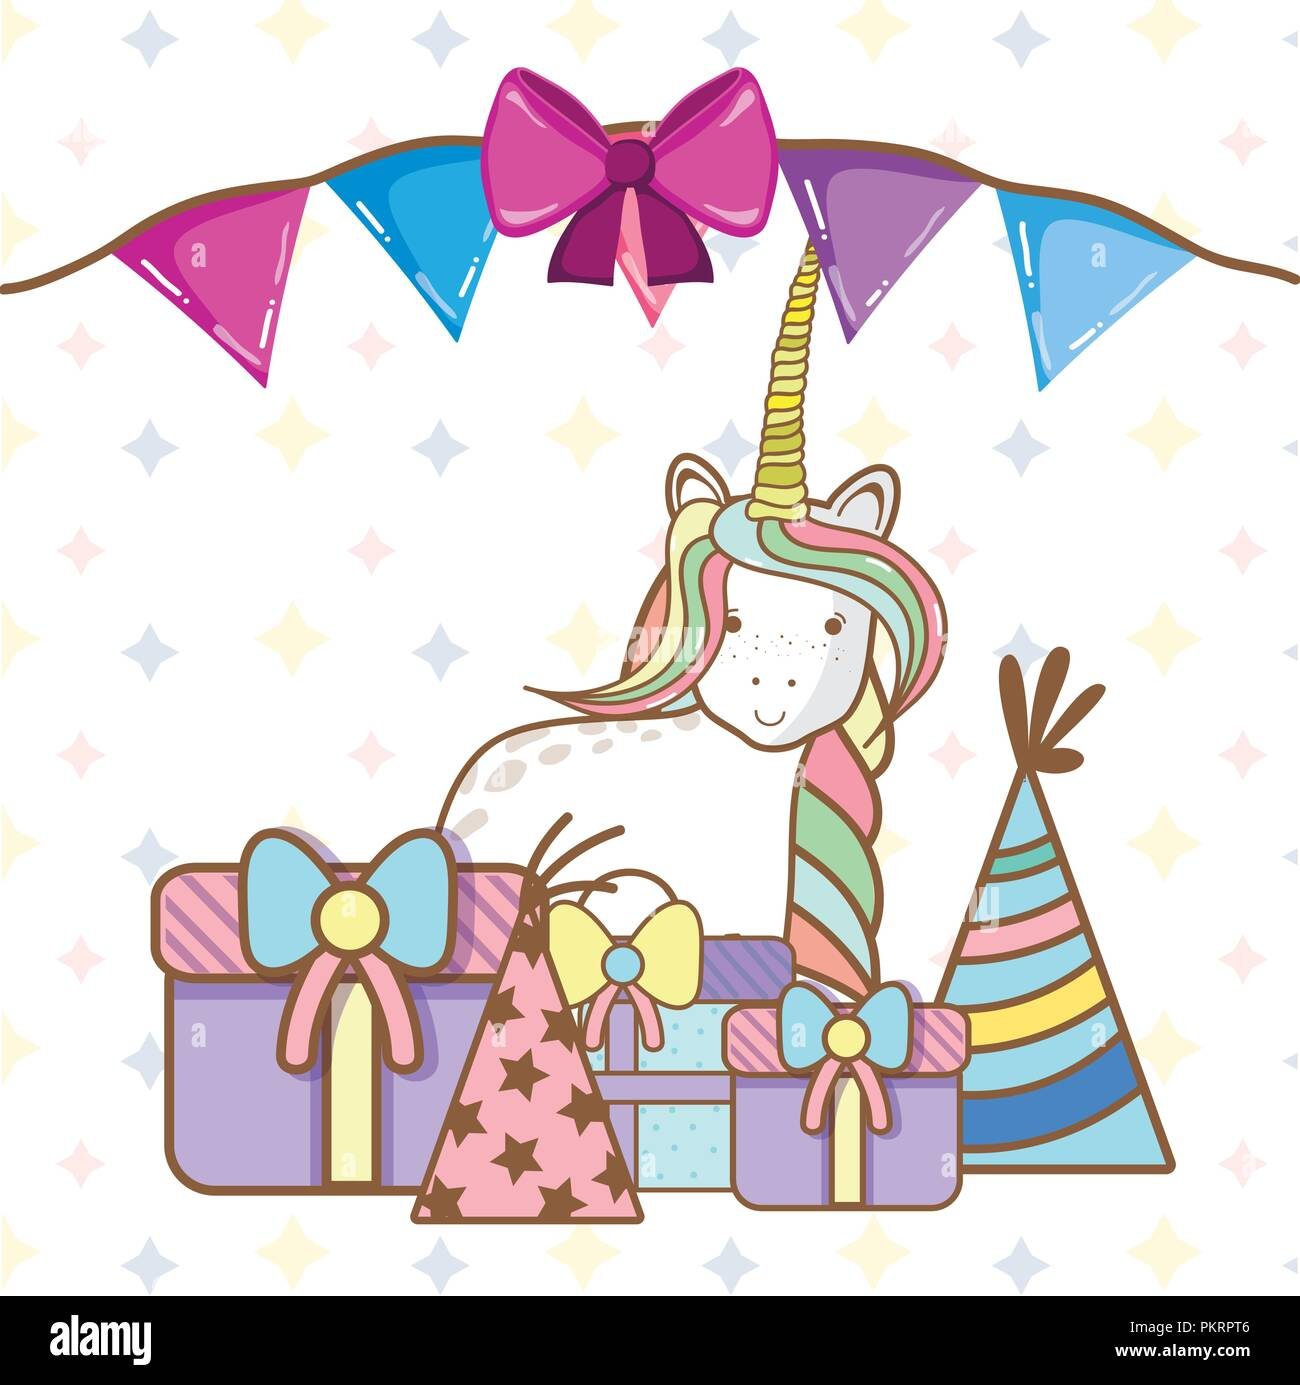 Geburtstag Party Einhorn Partei Cartoons Vektor Abbildung Bild